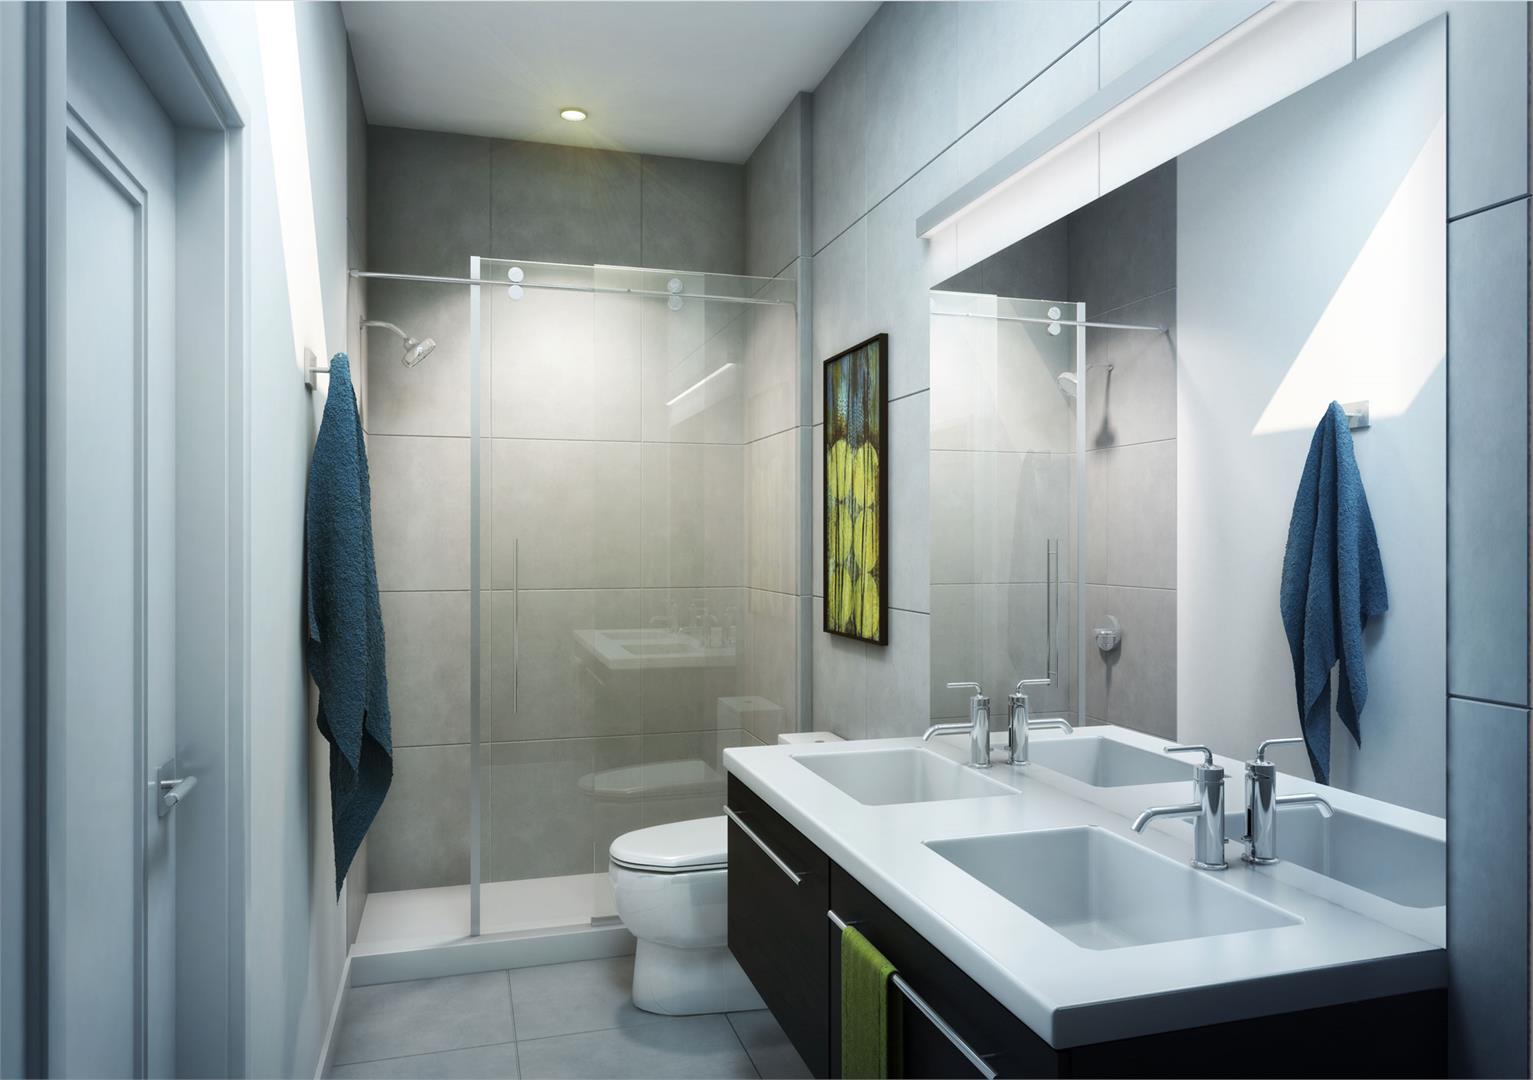 Theloftsat1111w_Bathroom